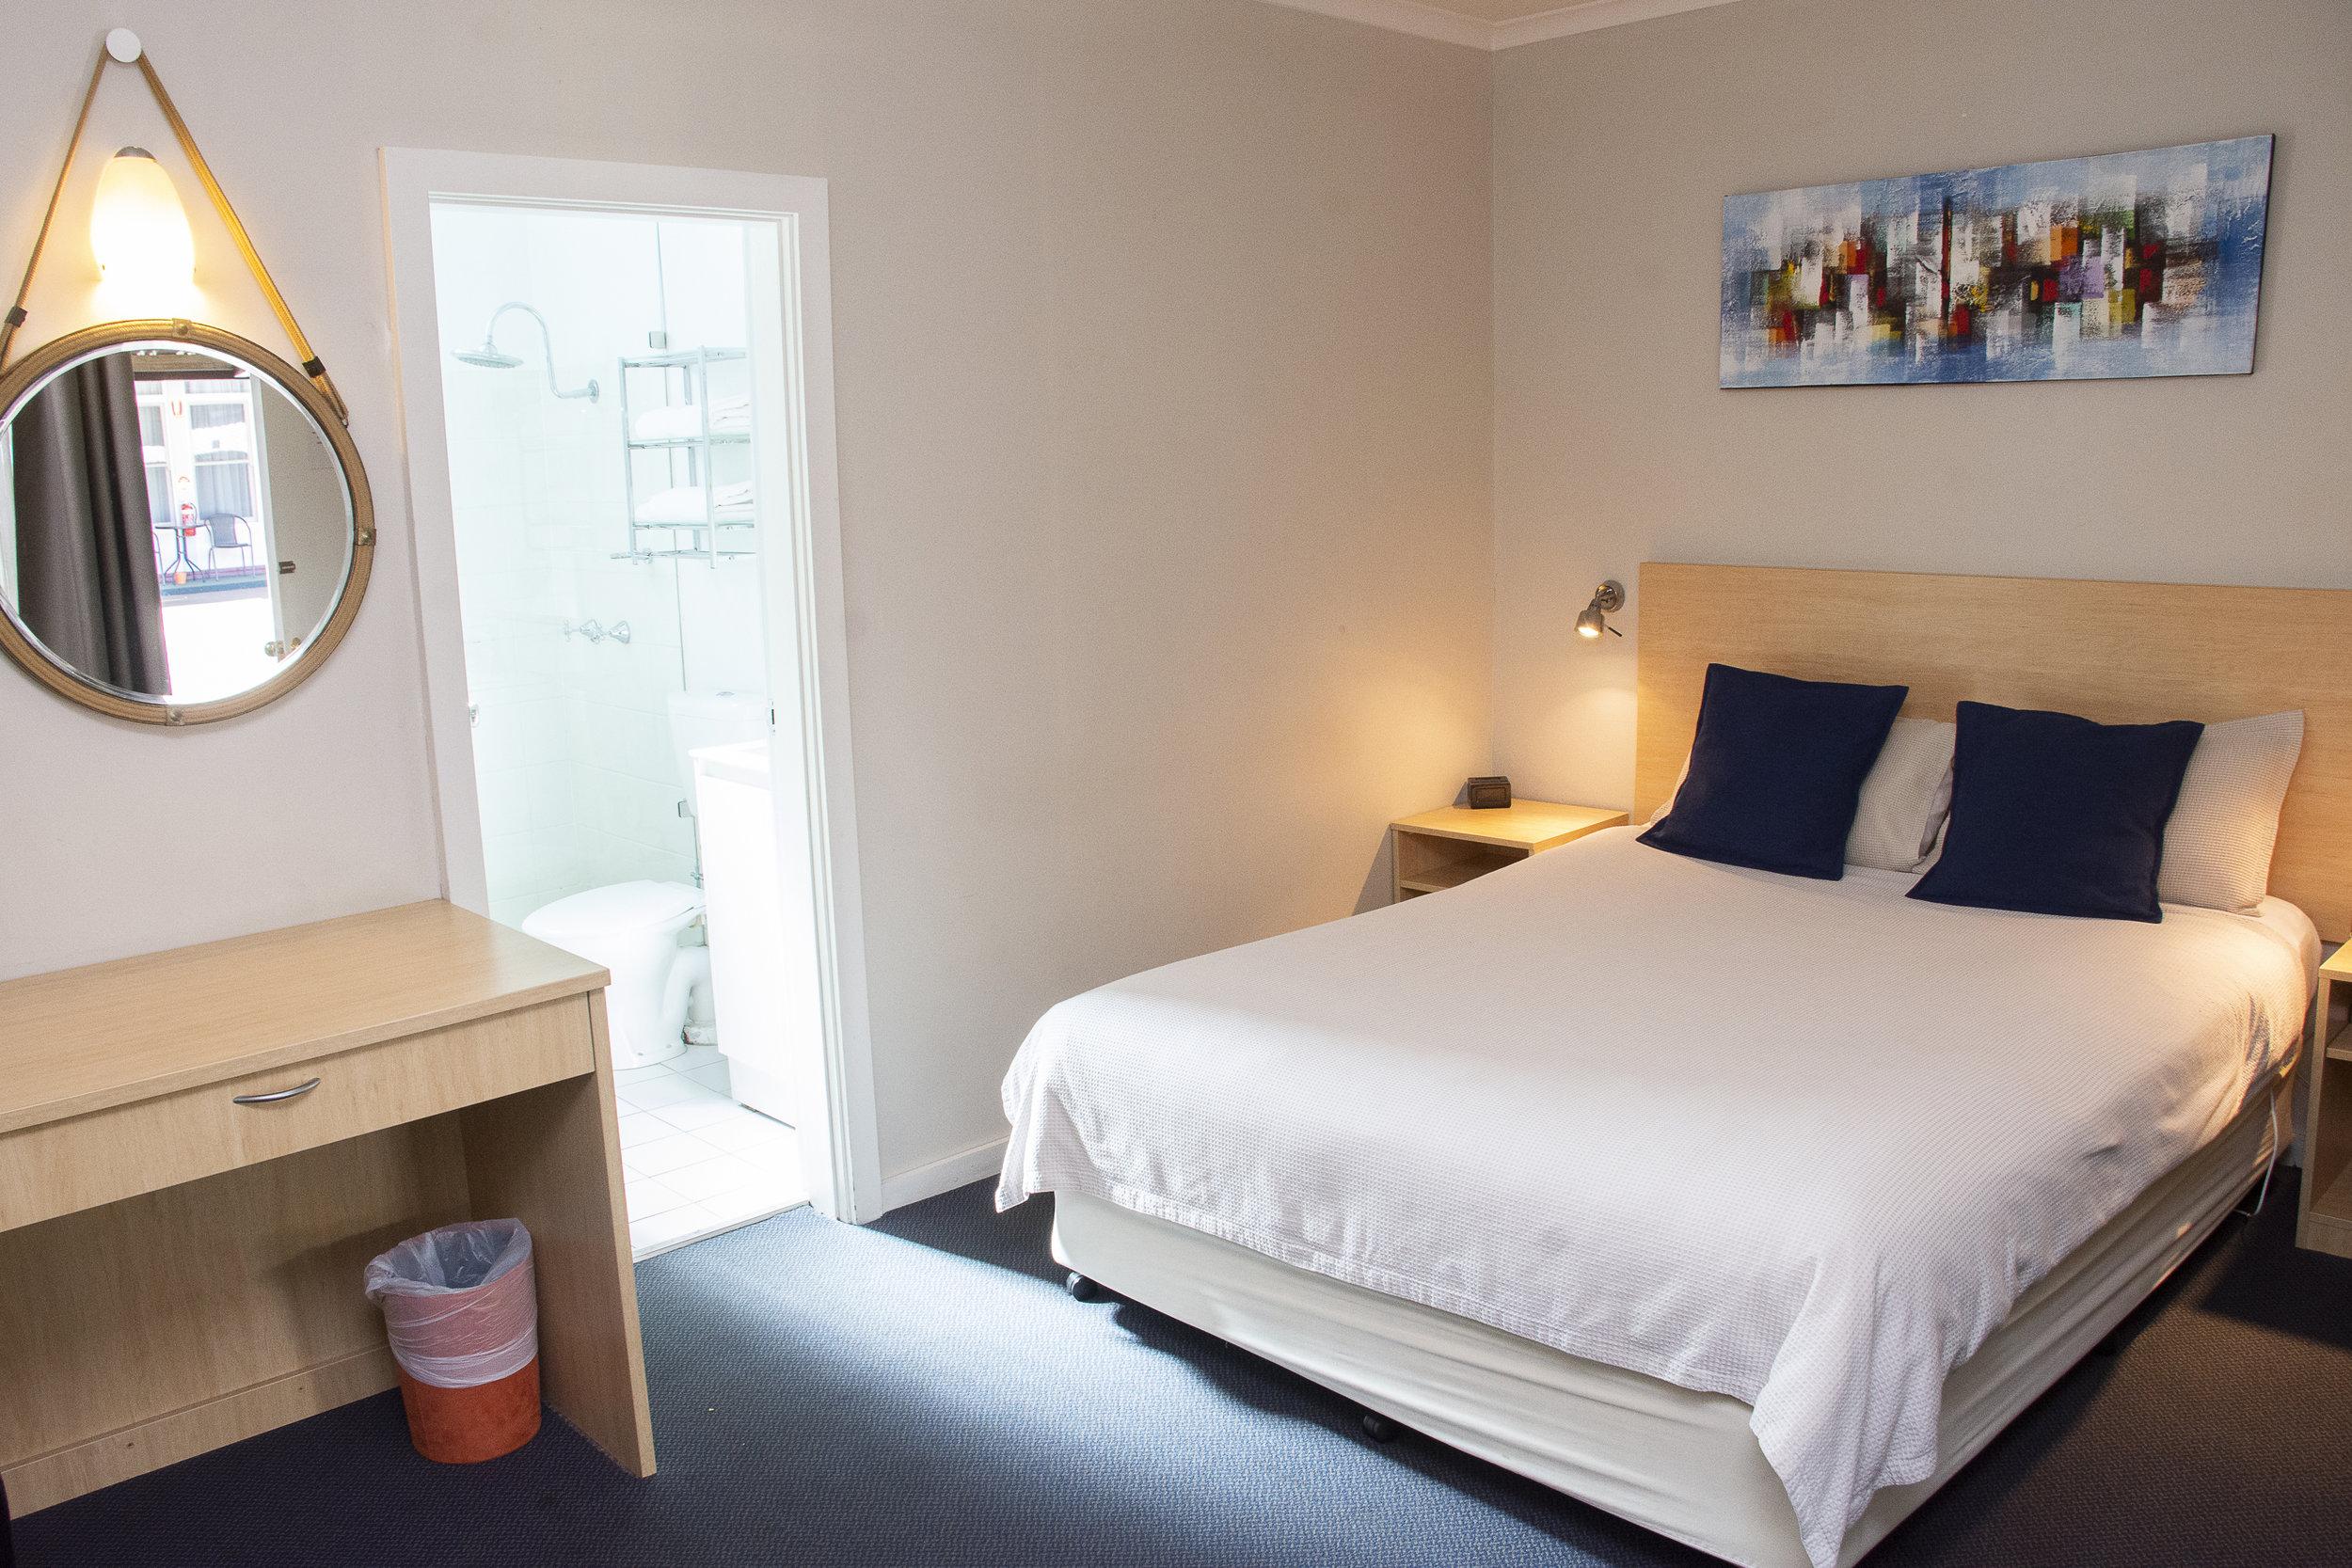 19 room 28 1.jpg